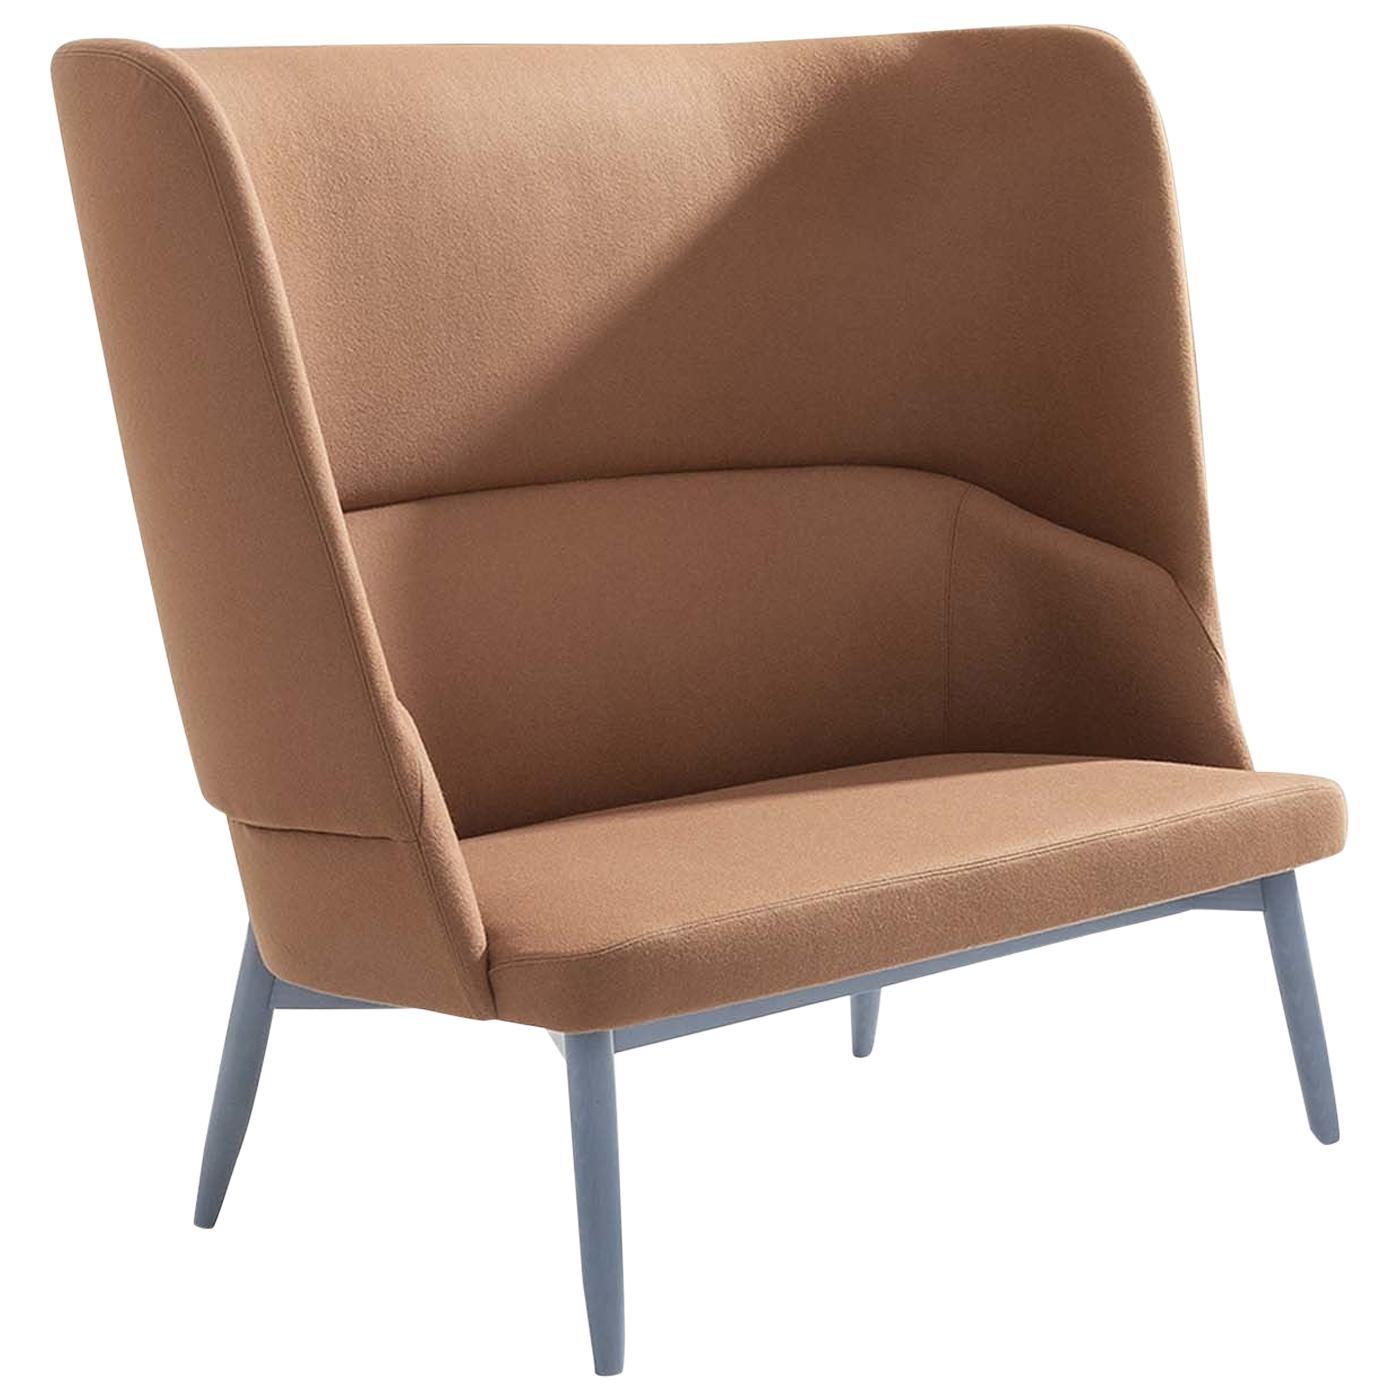 Spy 665 Red Sofa by Emilio Nanni